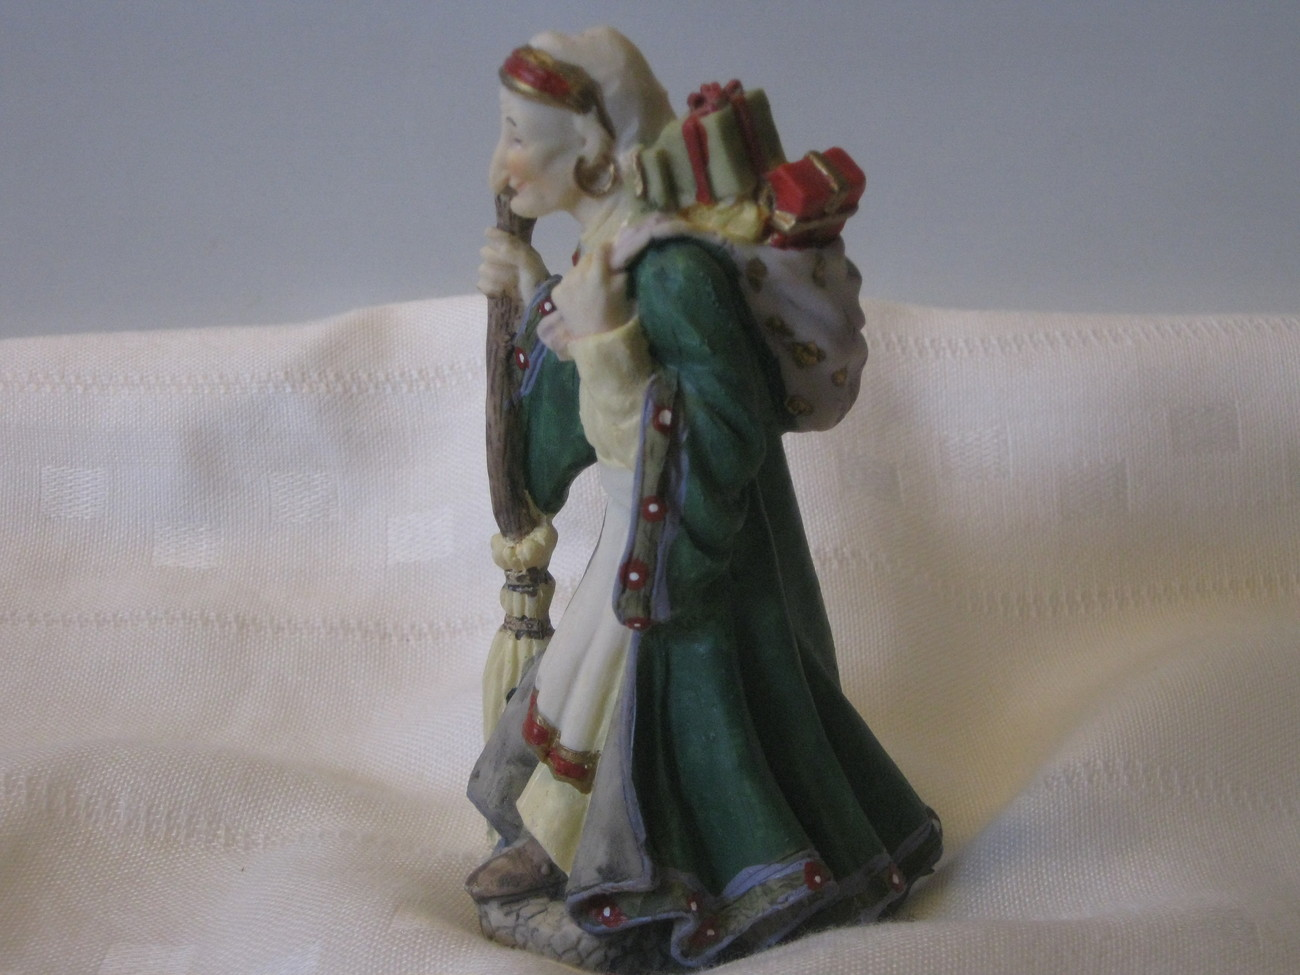 International Santa Claus Collection - La Befana - Italy, 1992